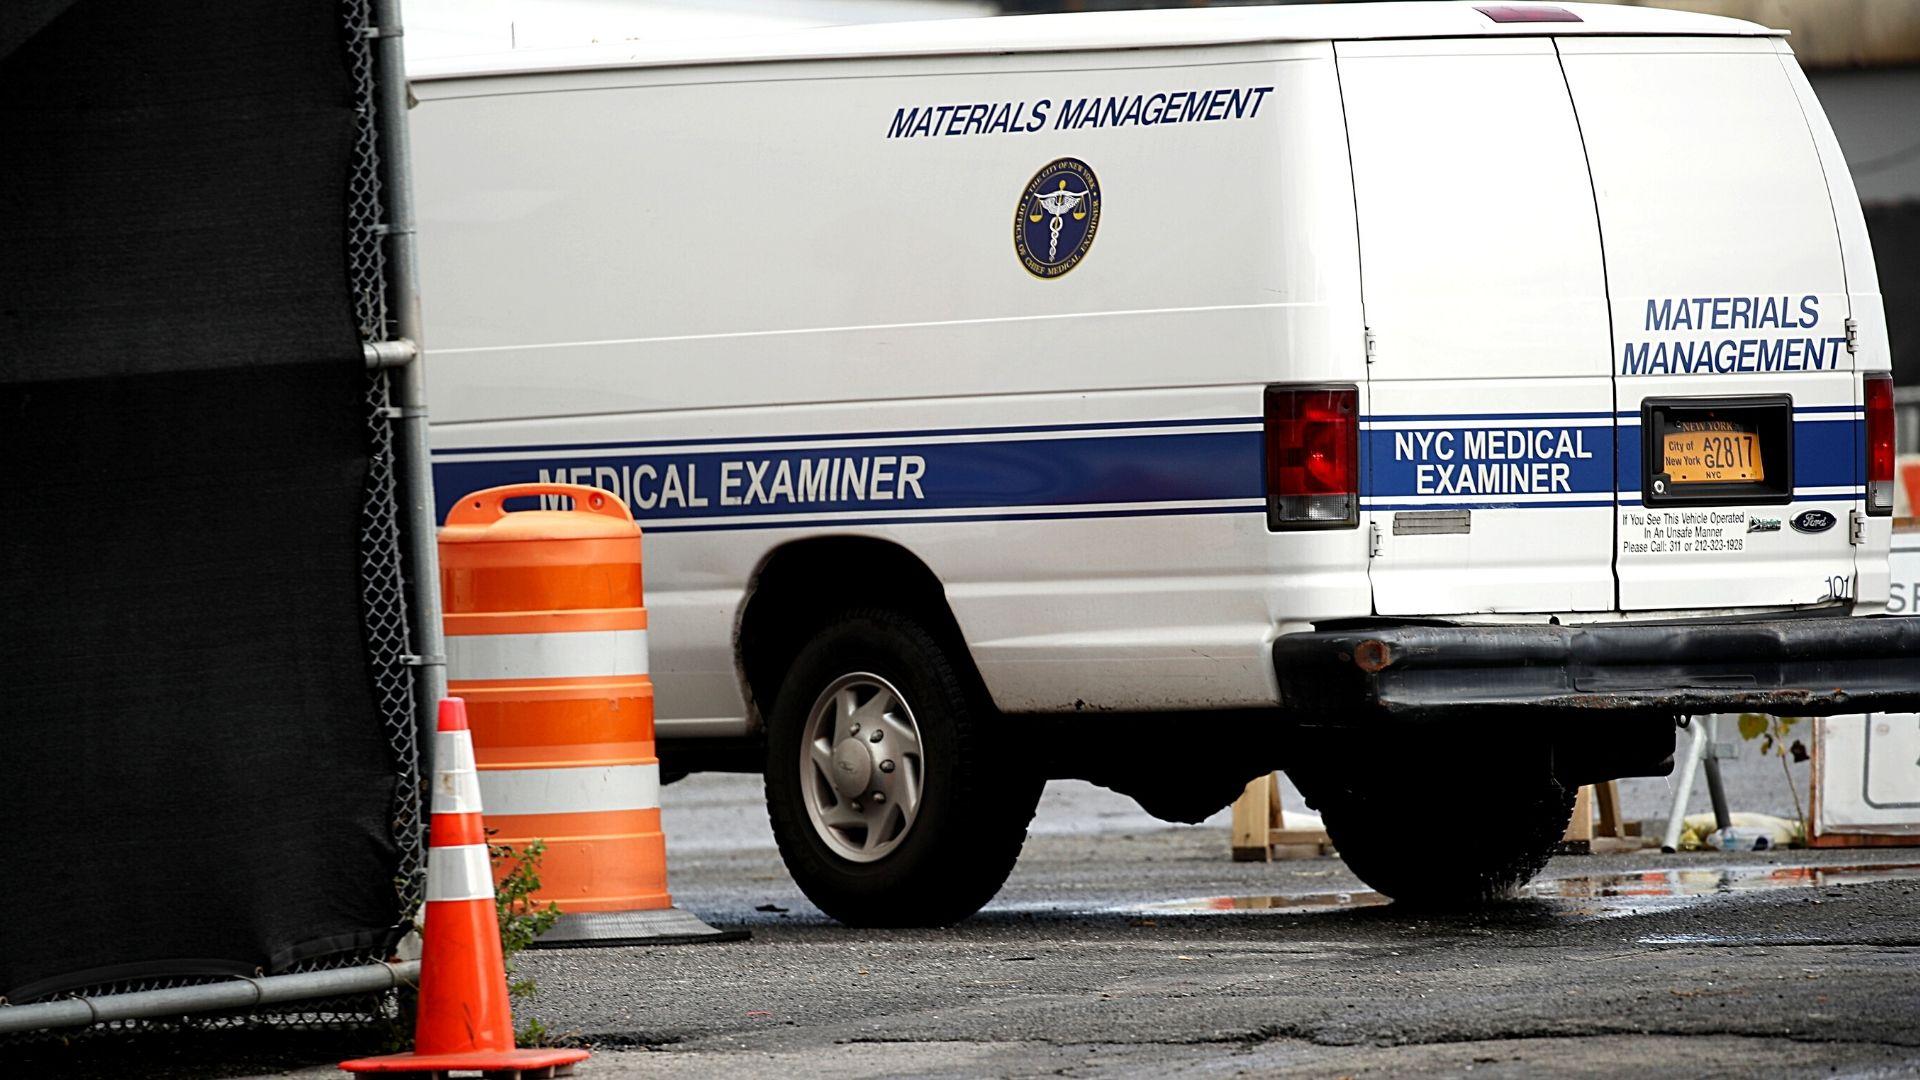 File photo of a New York City Medical Examiner's van in Brooklyn. (Spencer Platt/Getty Images)